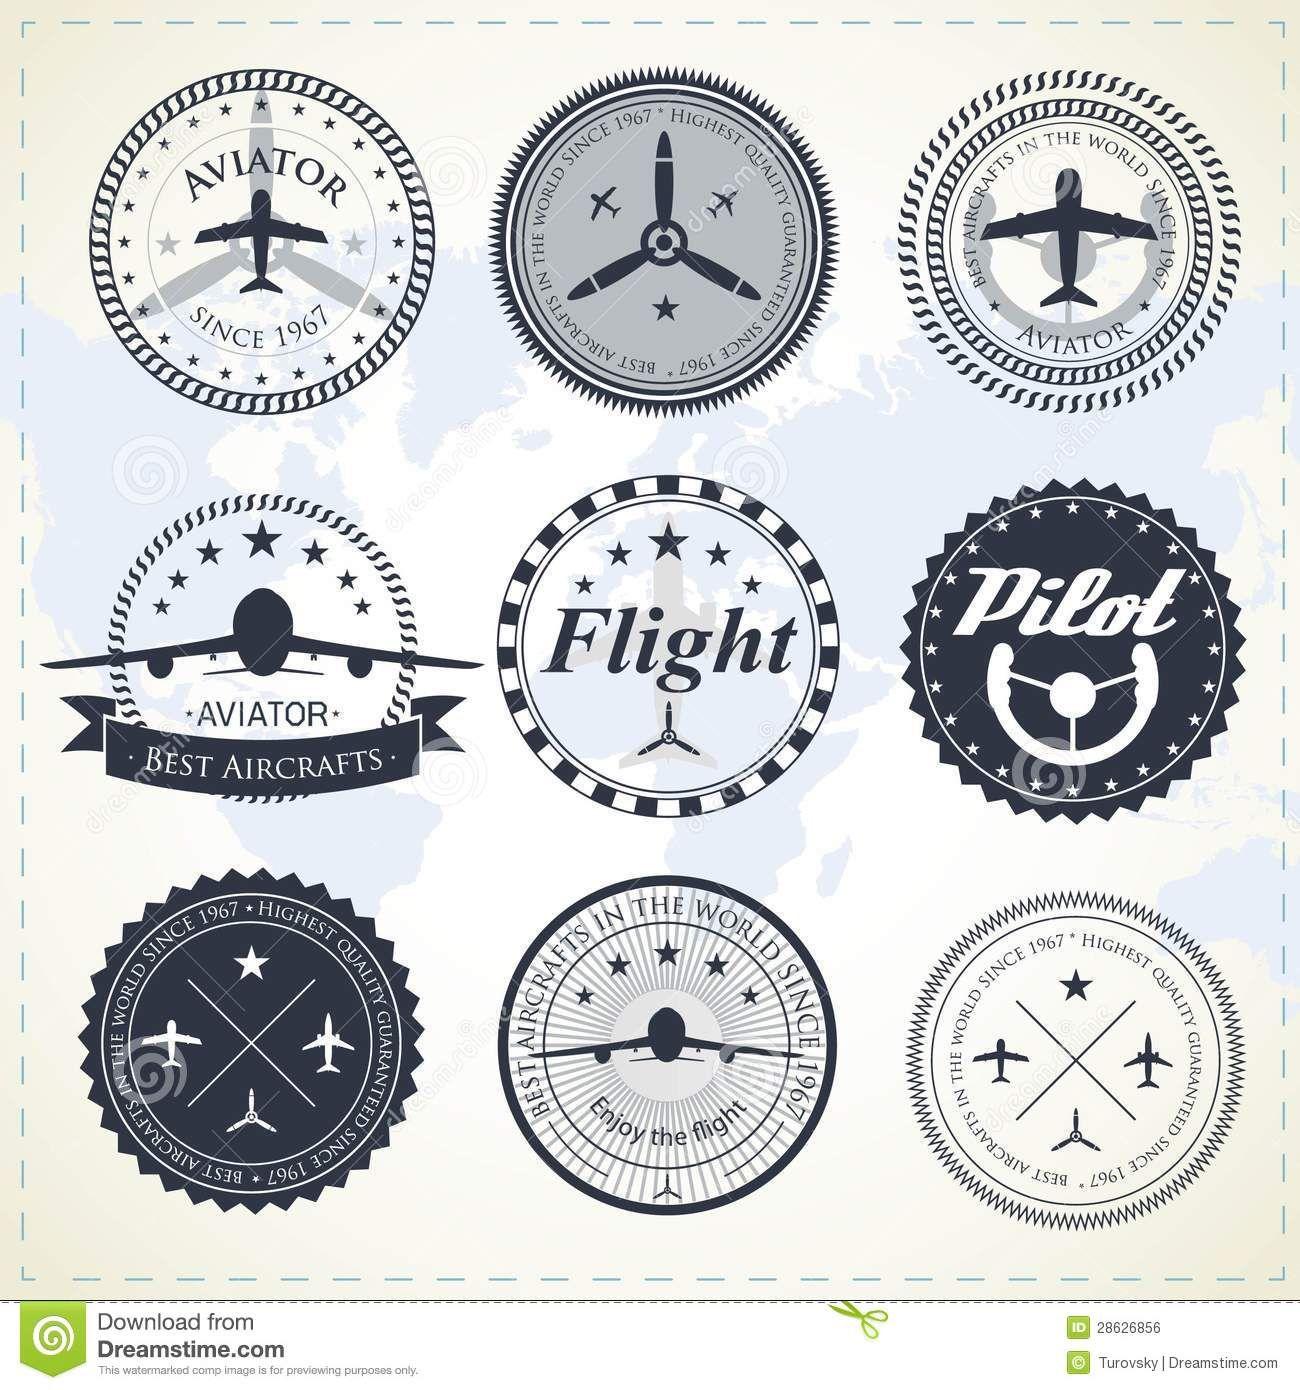 Mrp logo clipart jpg library vintage aviation logos - Google Search … | New MRP Logo | Aviat… jpg library